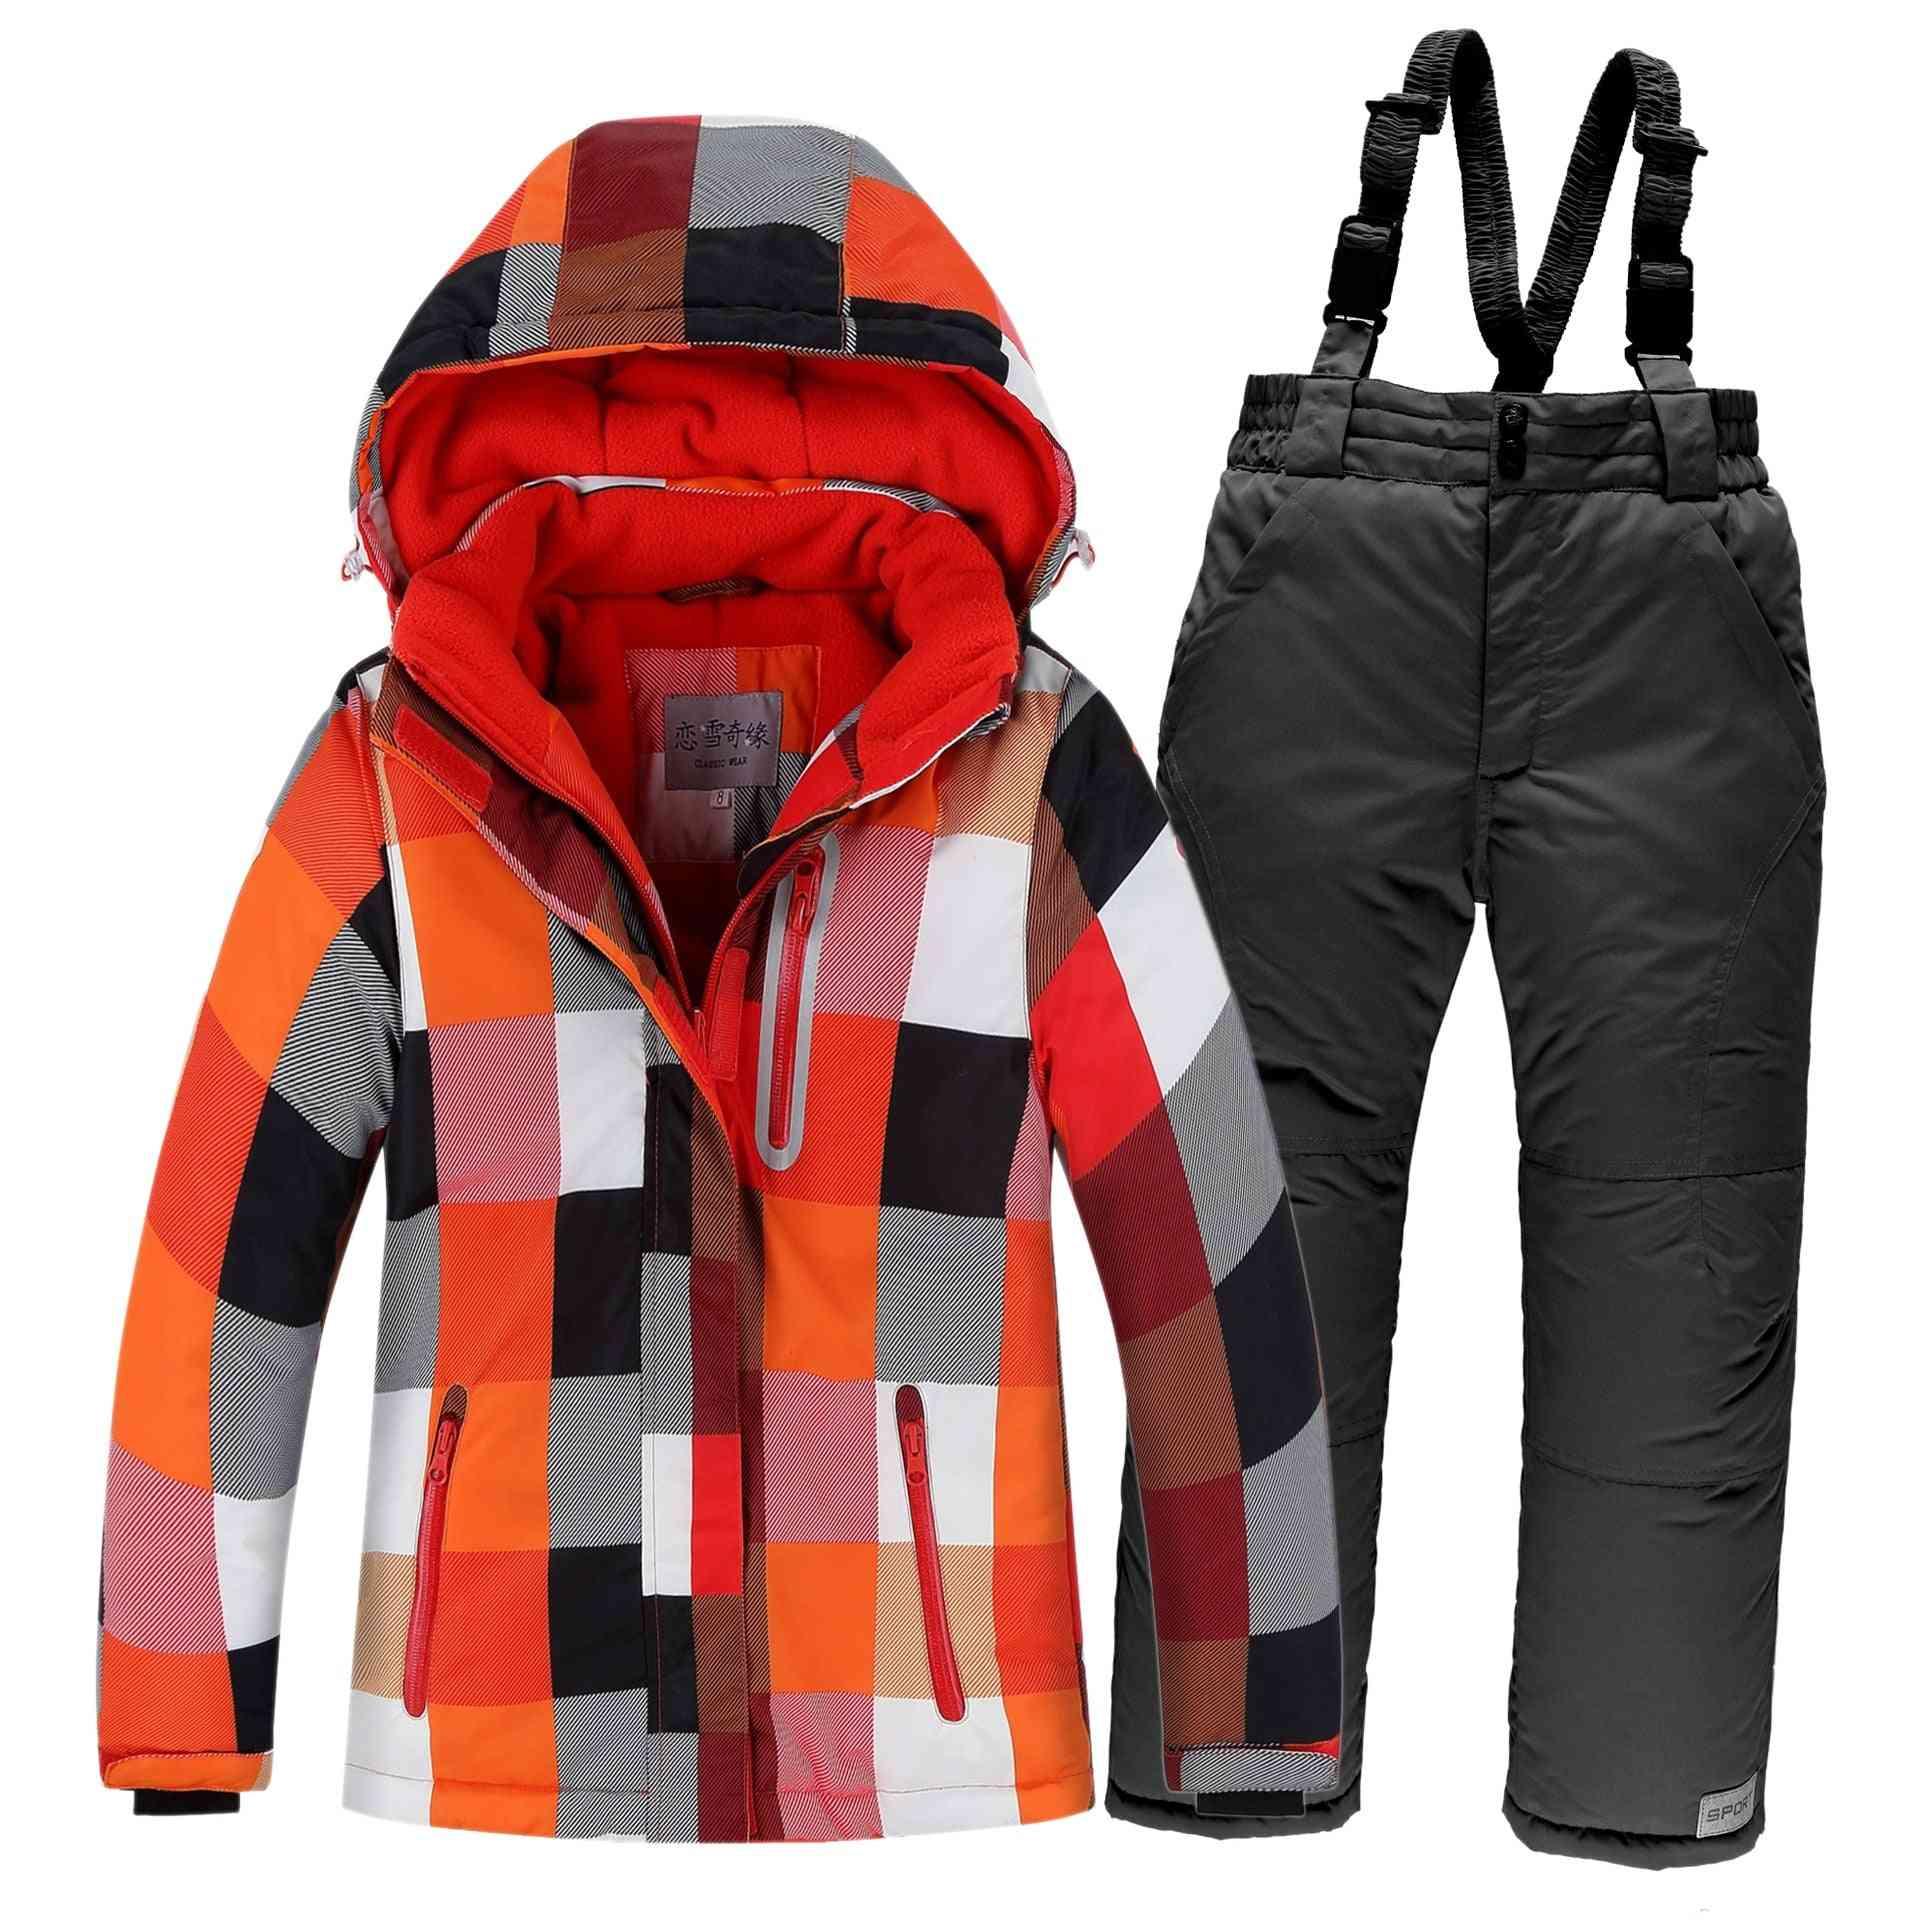 Jacket Pants Ski Set For Kids